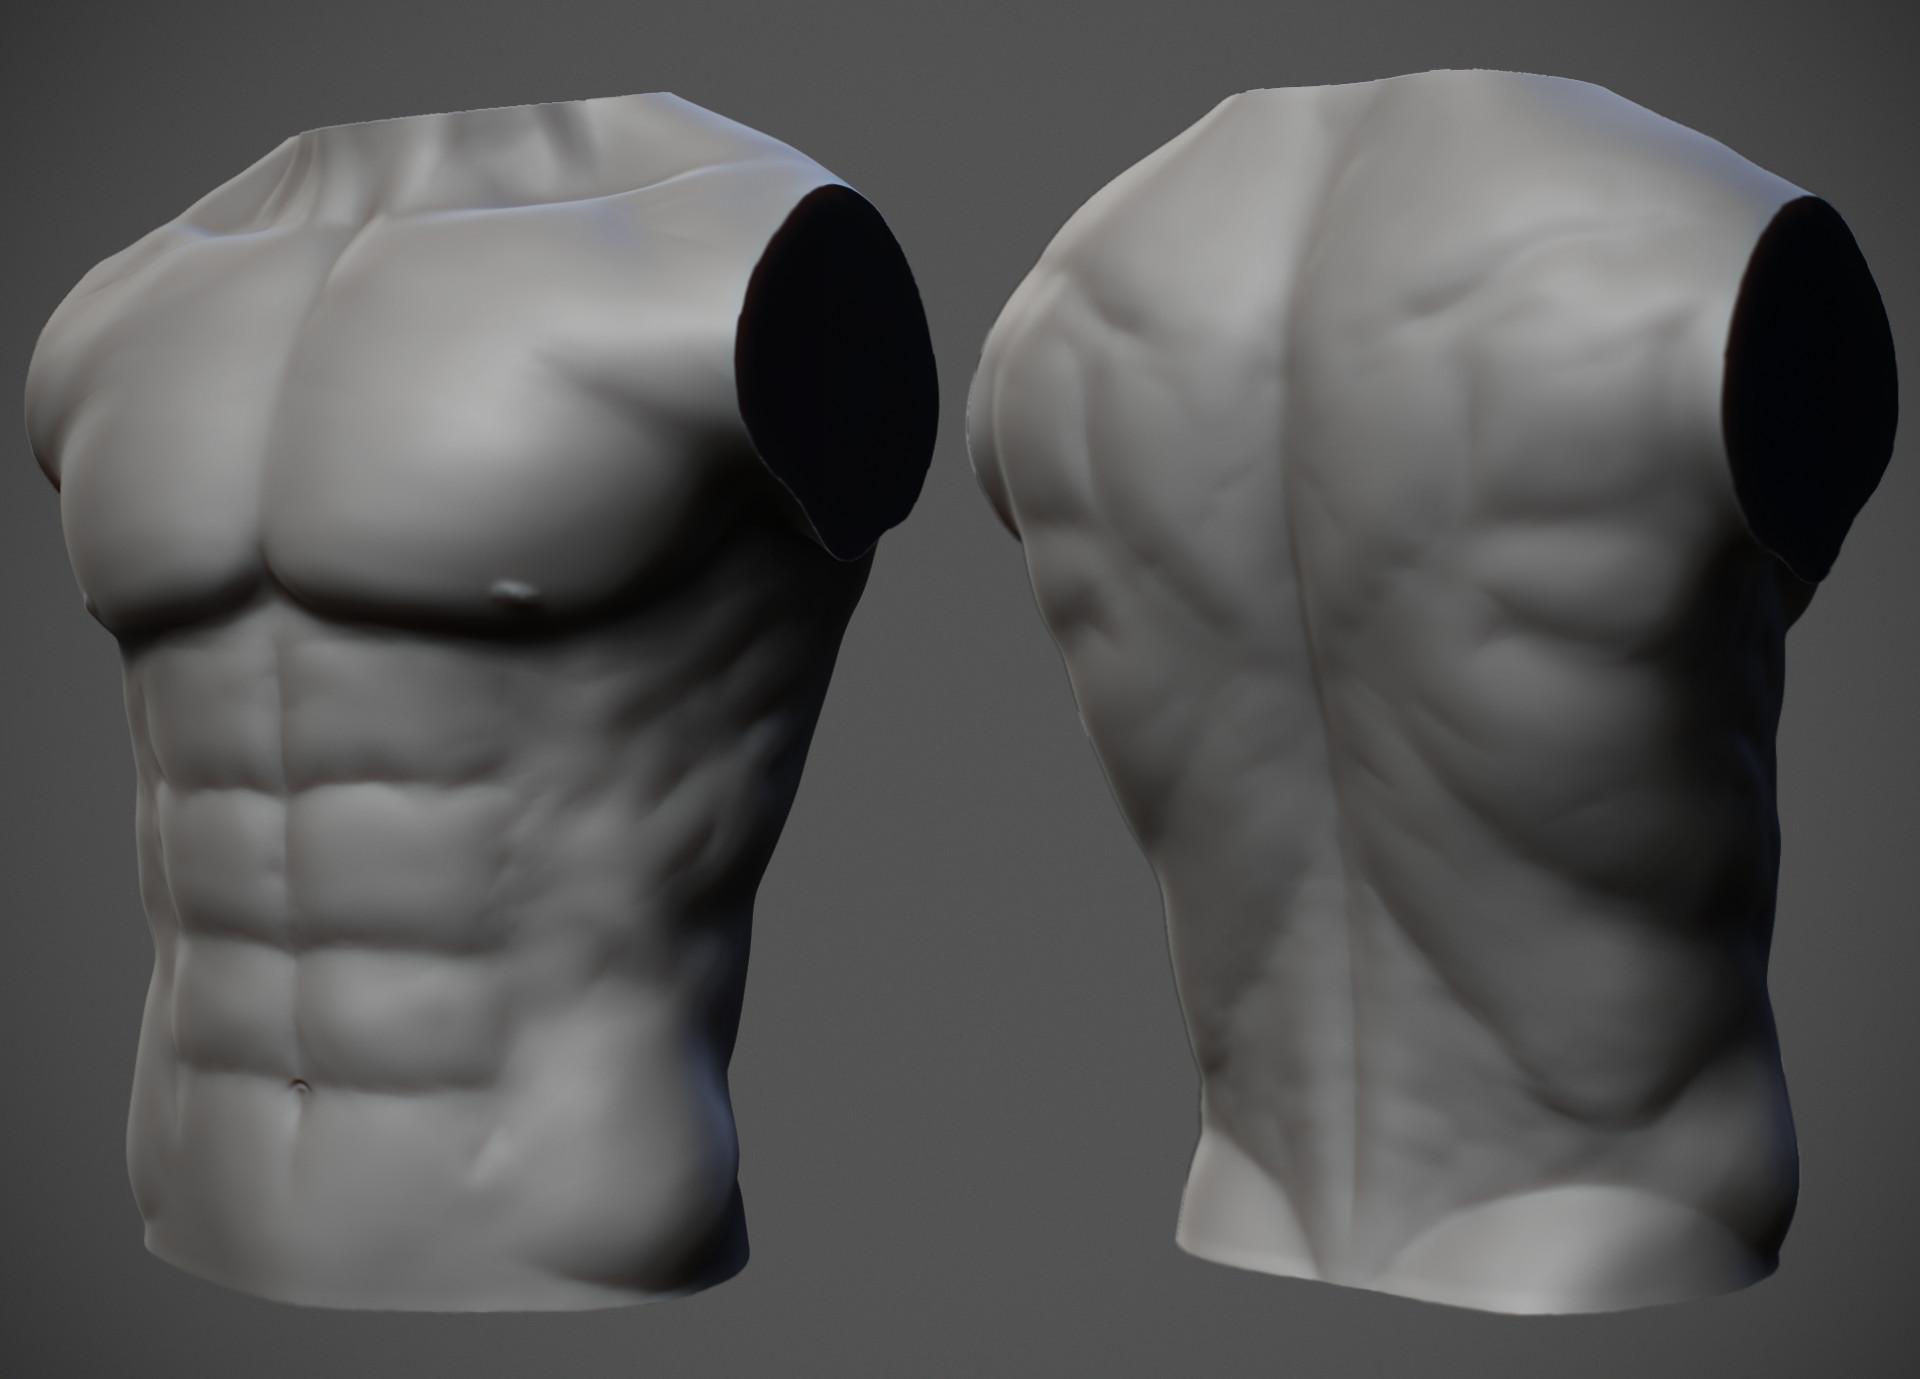 Thomas Debons - Male anatomy study